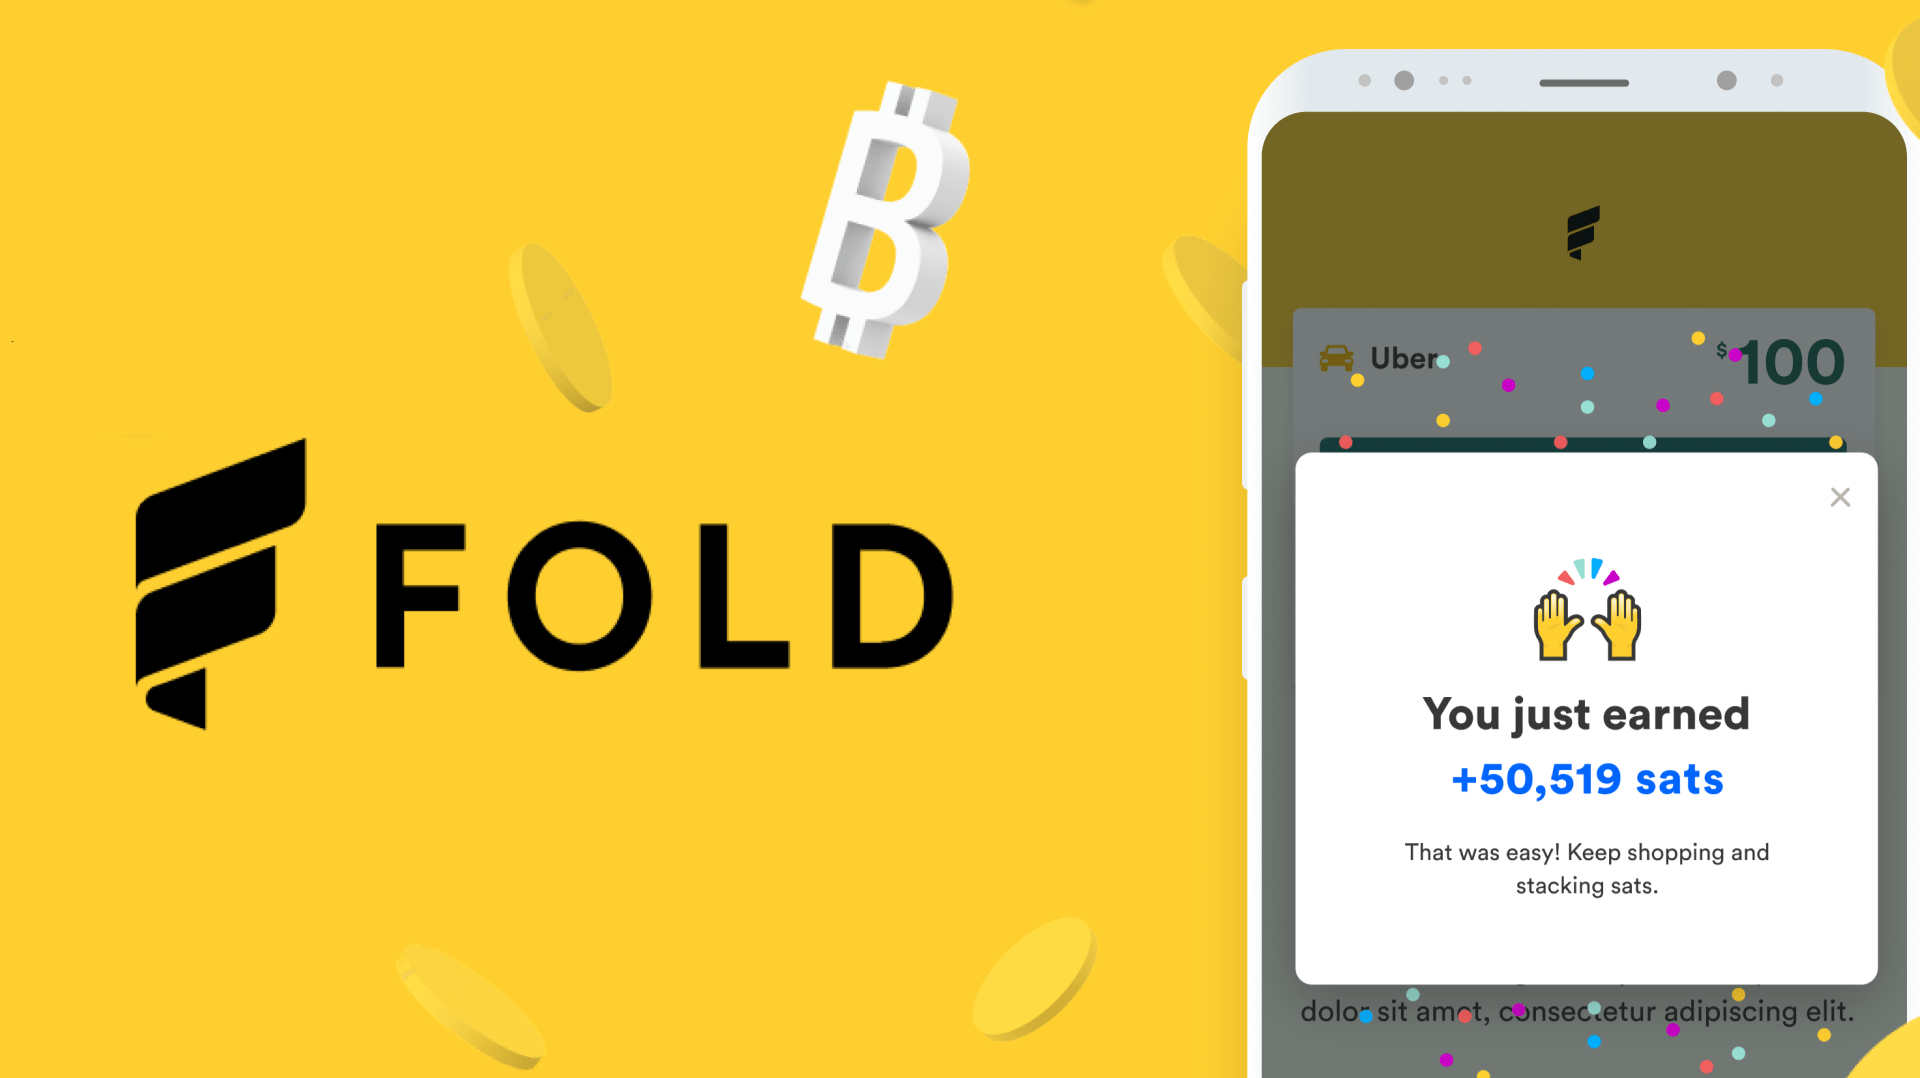 Fold App Review: Free BTC Cashback Rewards, Lightning Transactions, and the First BTC Cashback Rewards Prepaid Debit Card